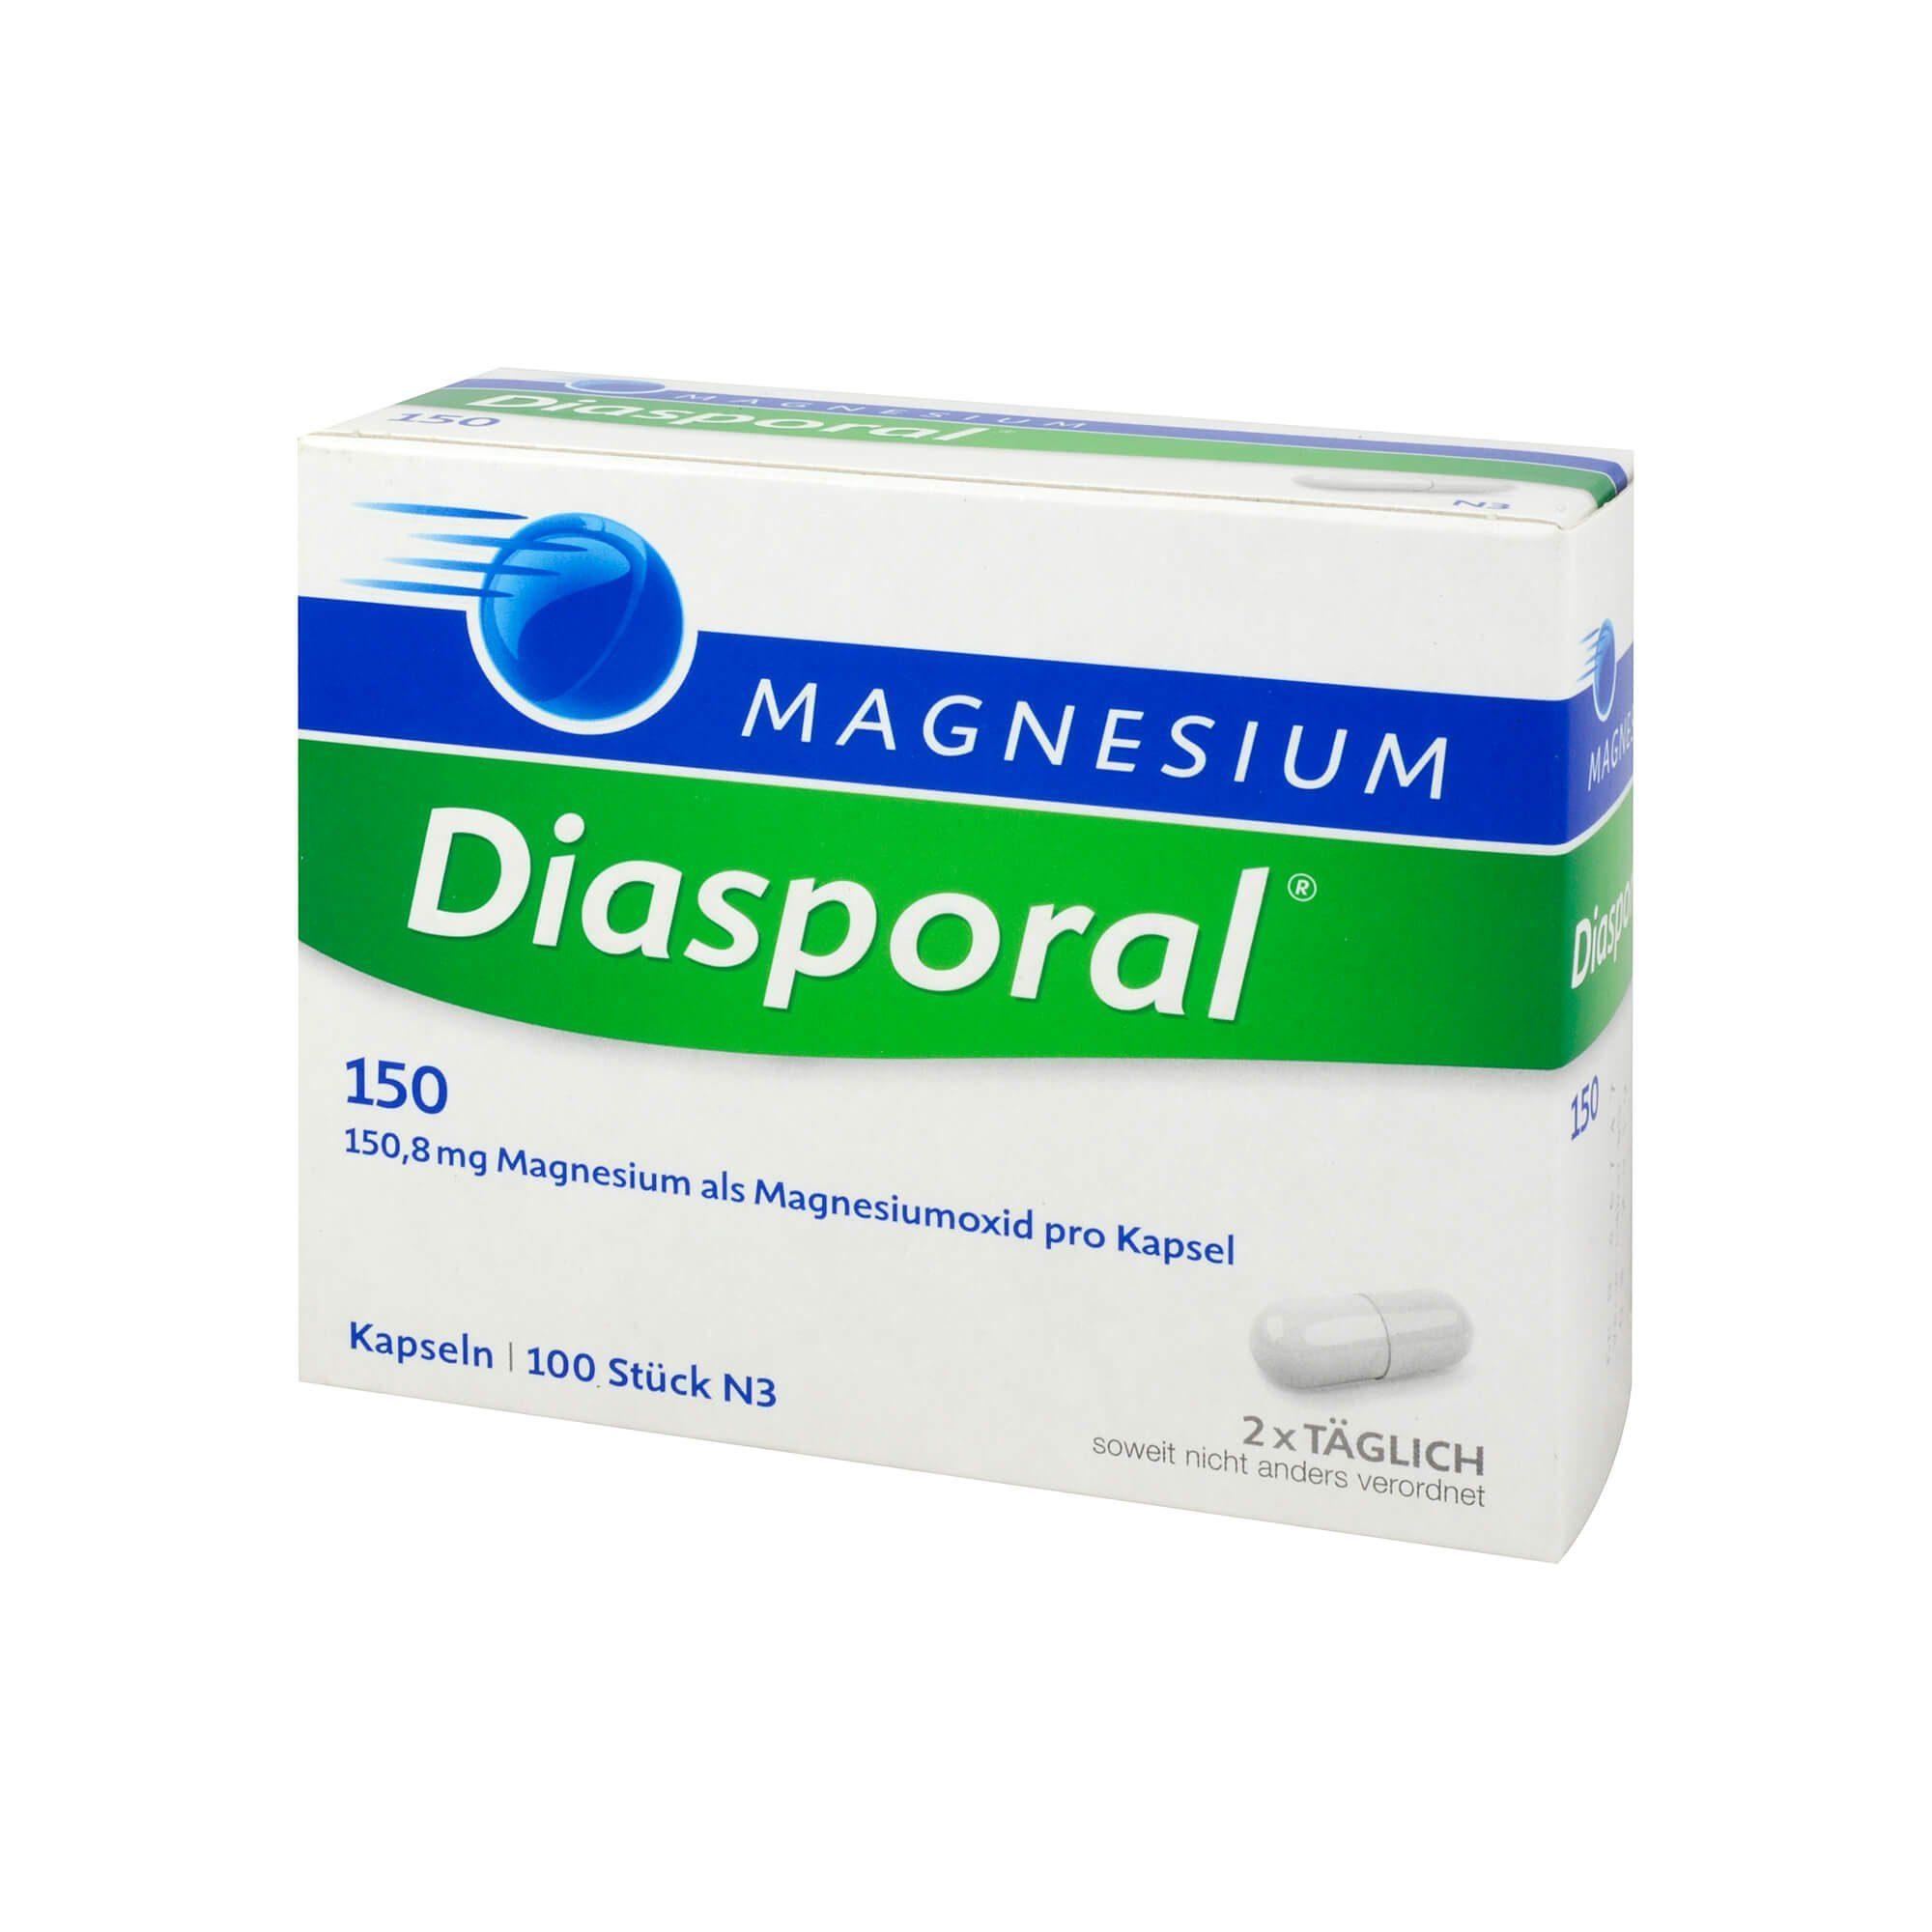 Magnesium DIASPORAL 150 Kapseln , 100 St